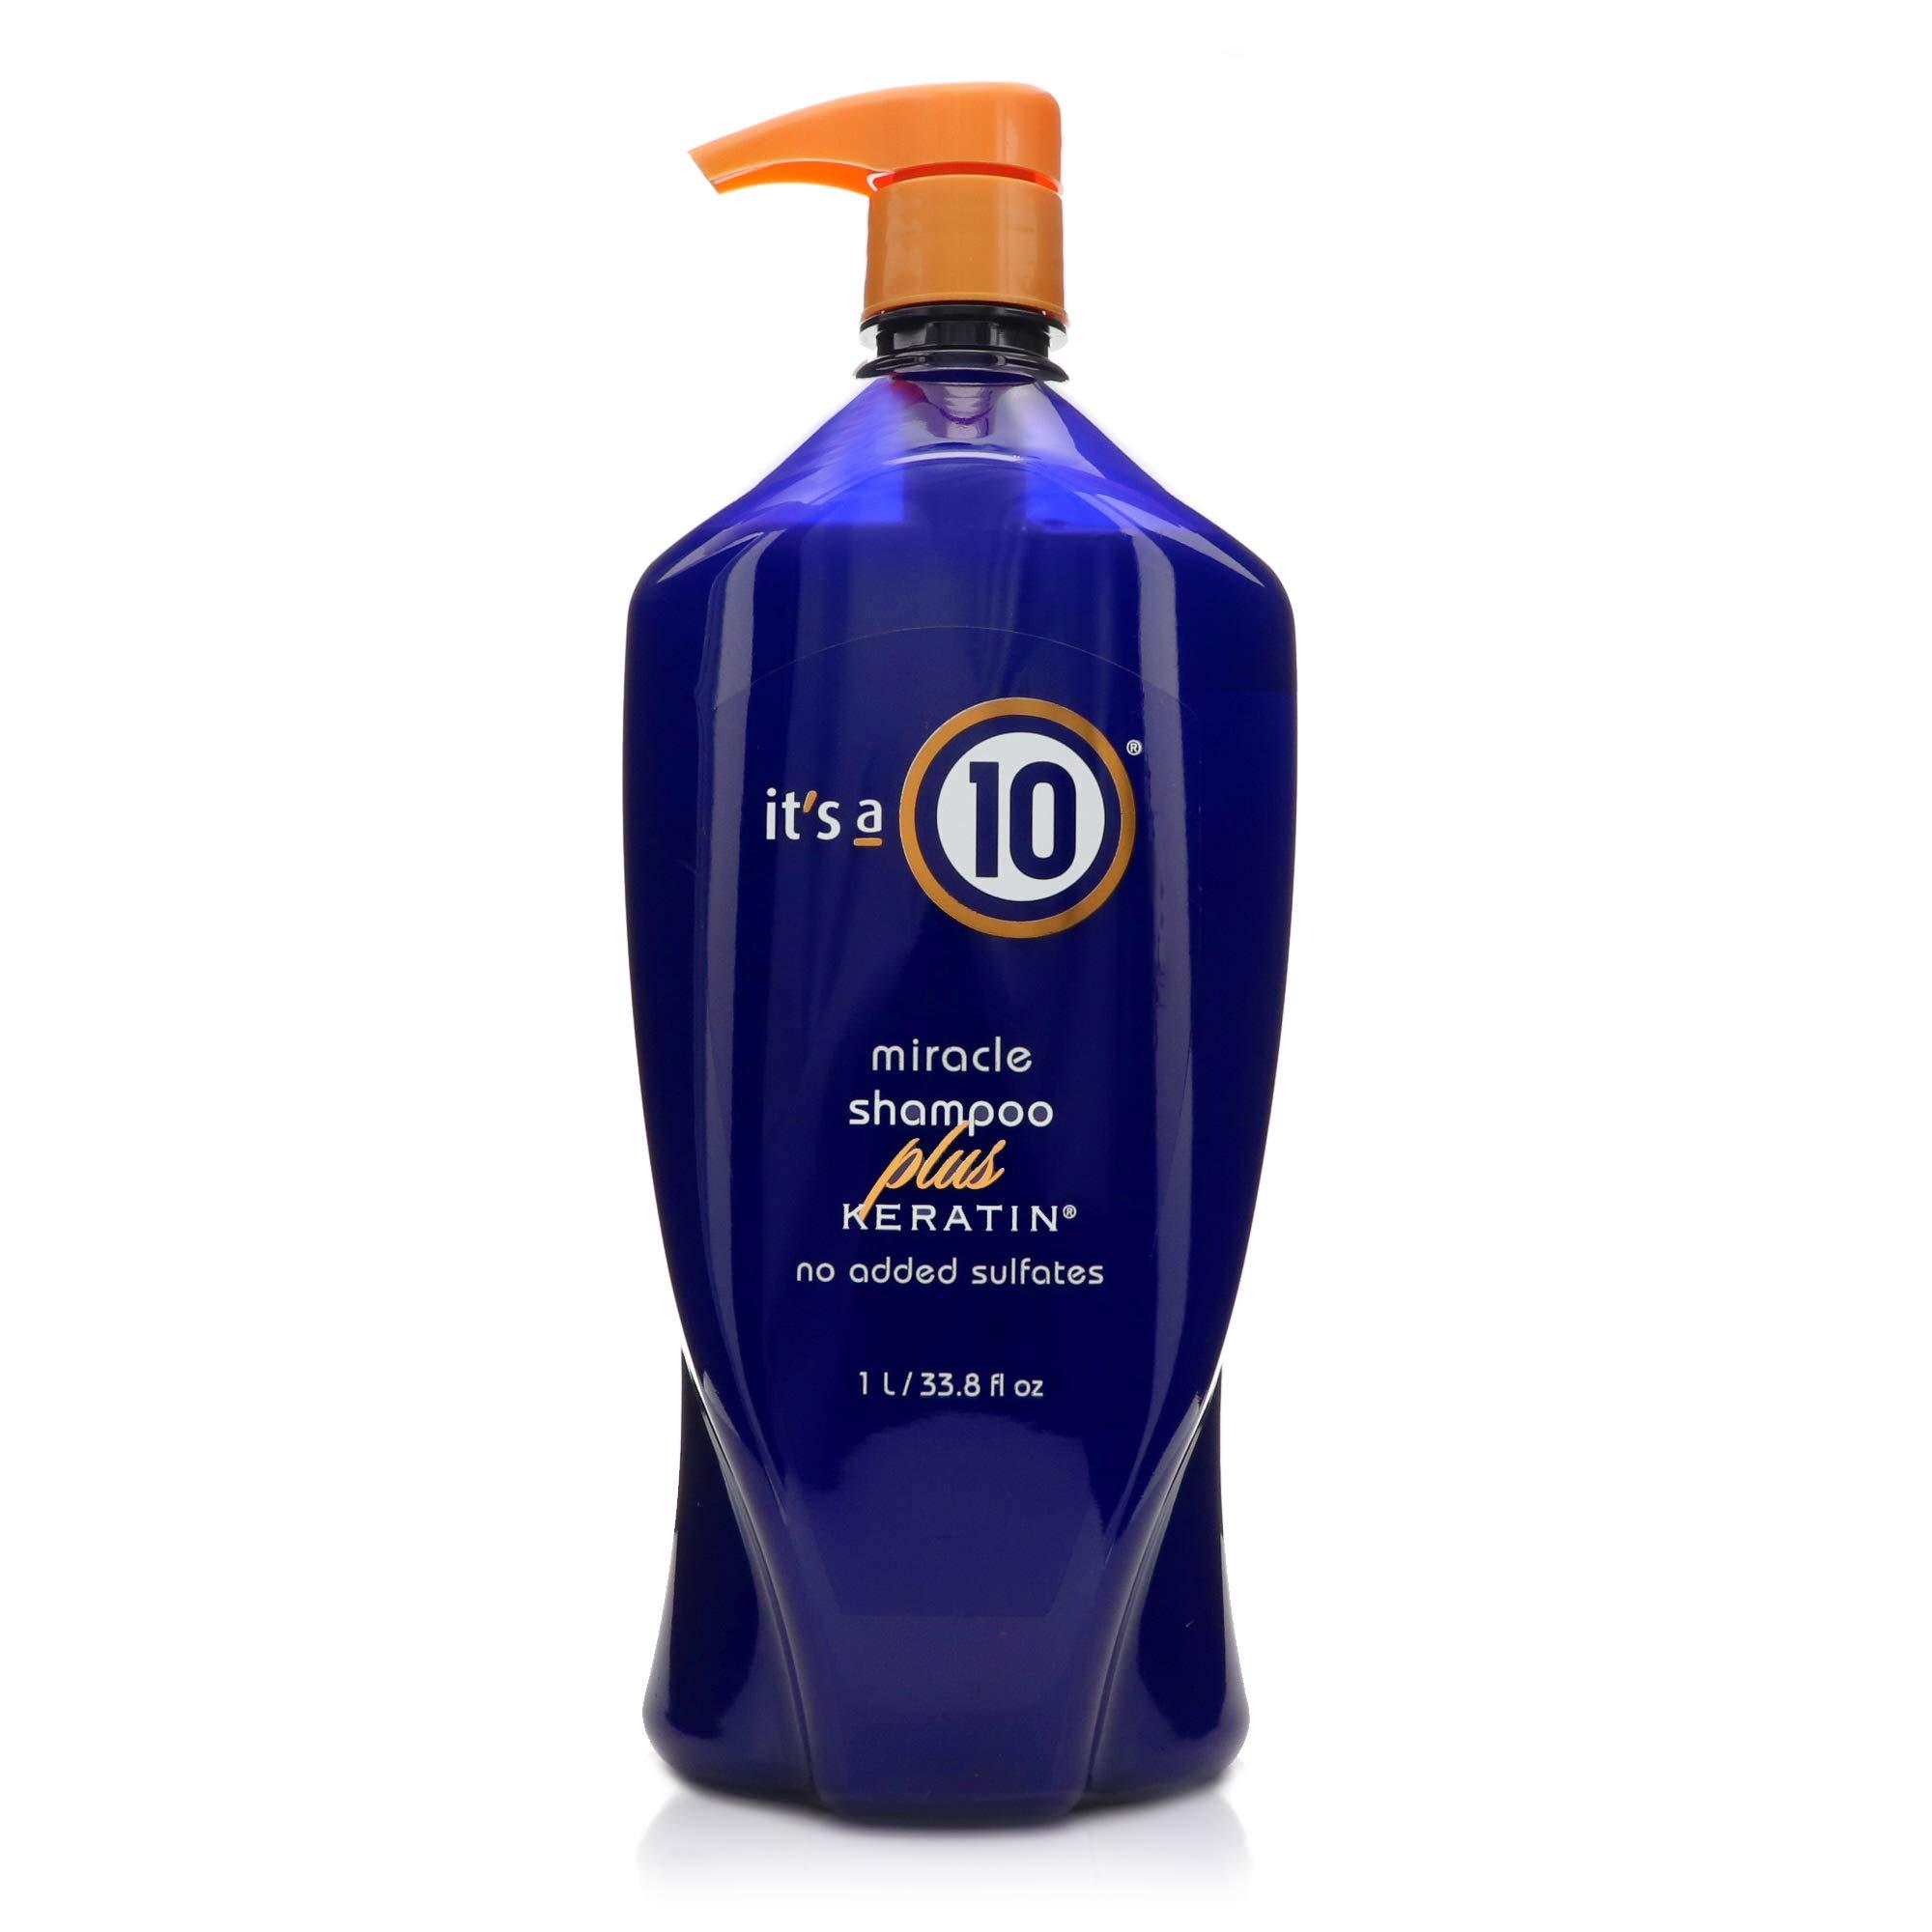 It's a 10 Haircare Miracle Shampoo Plus Keratin, 33.8 fl. oz.